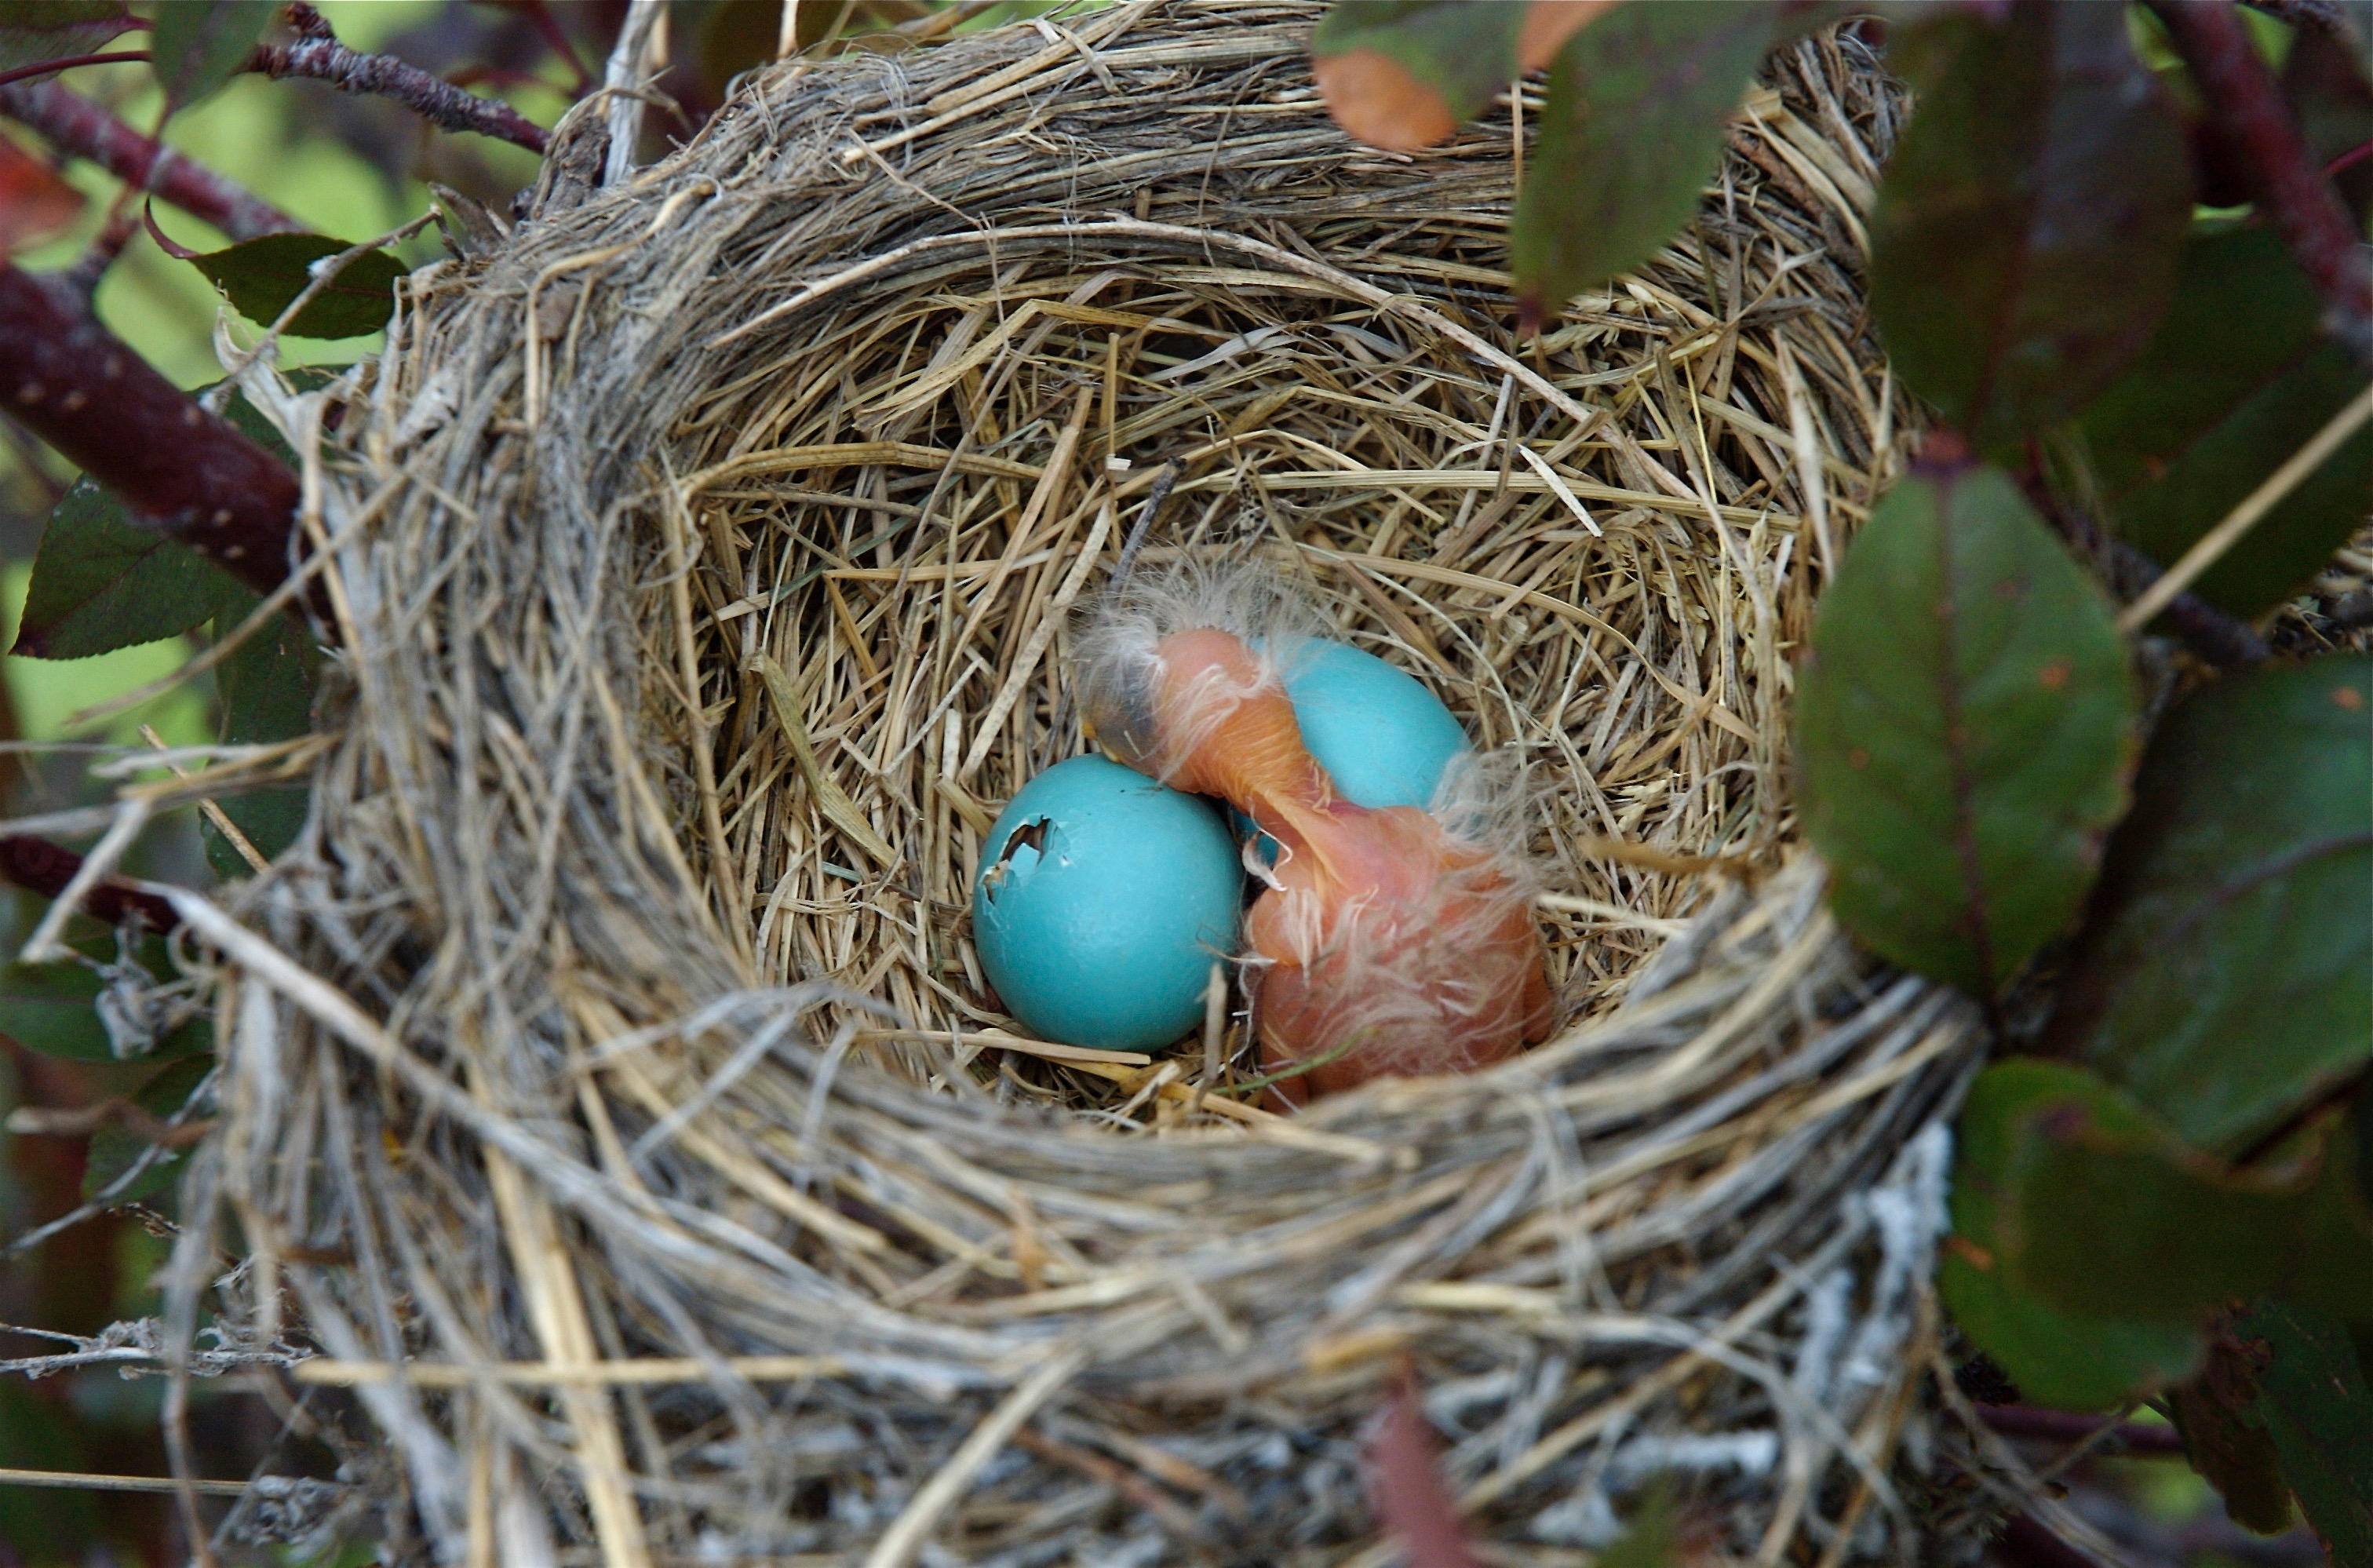 Baby Robin Hatching